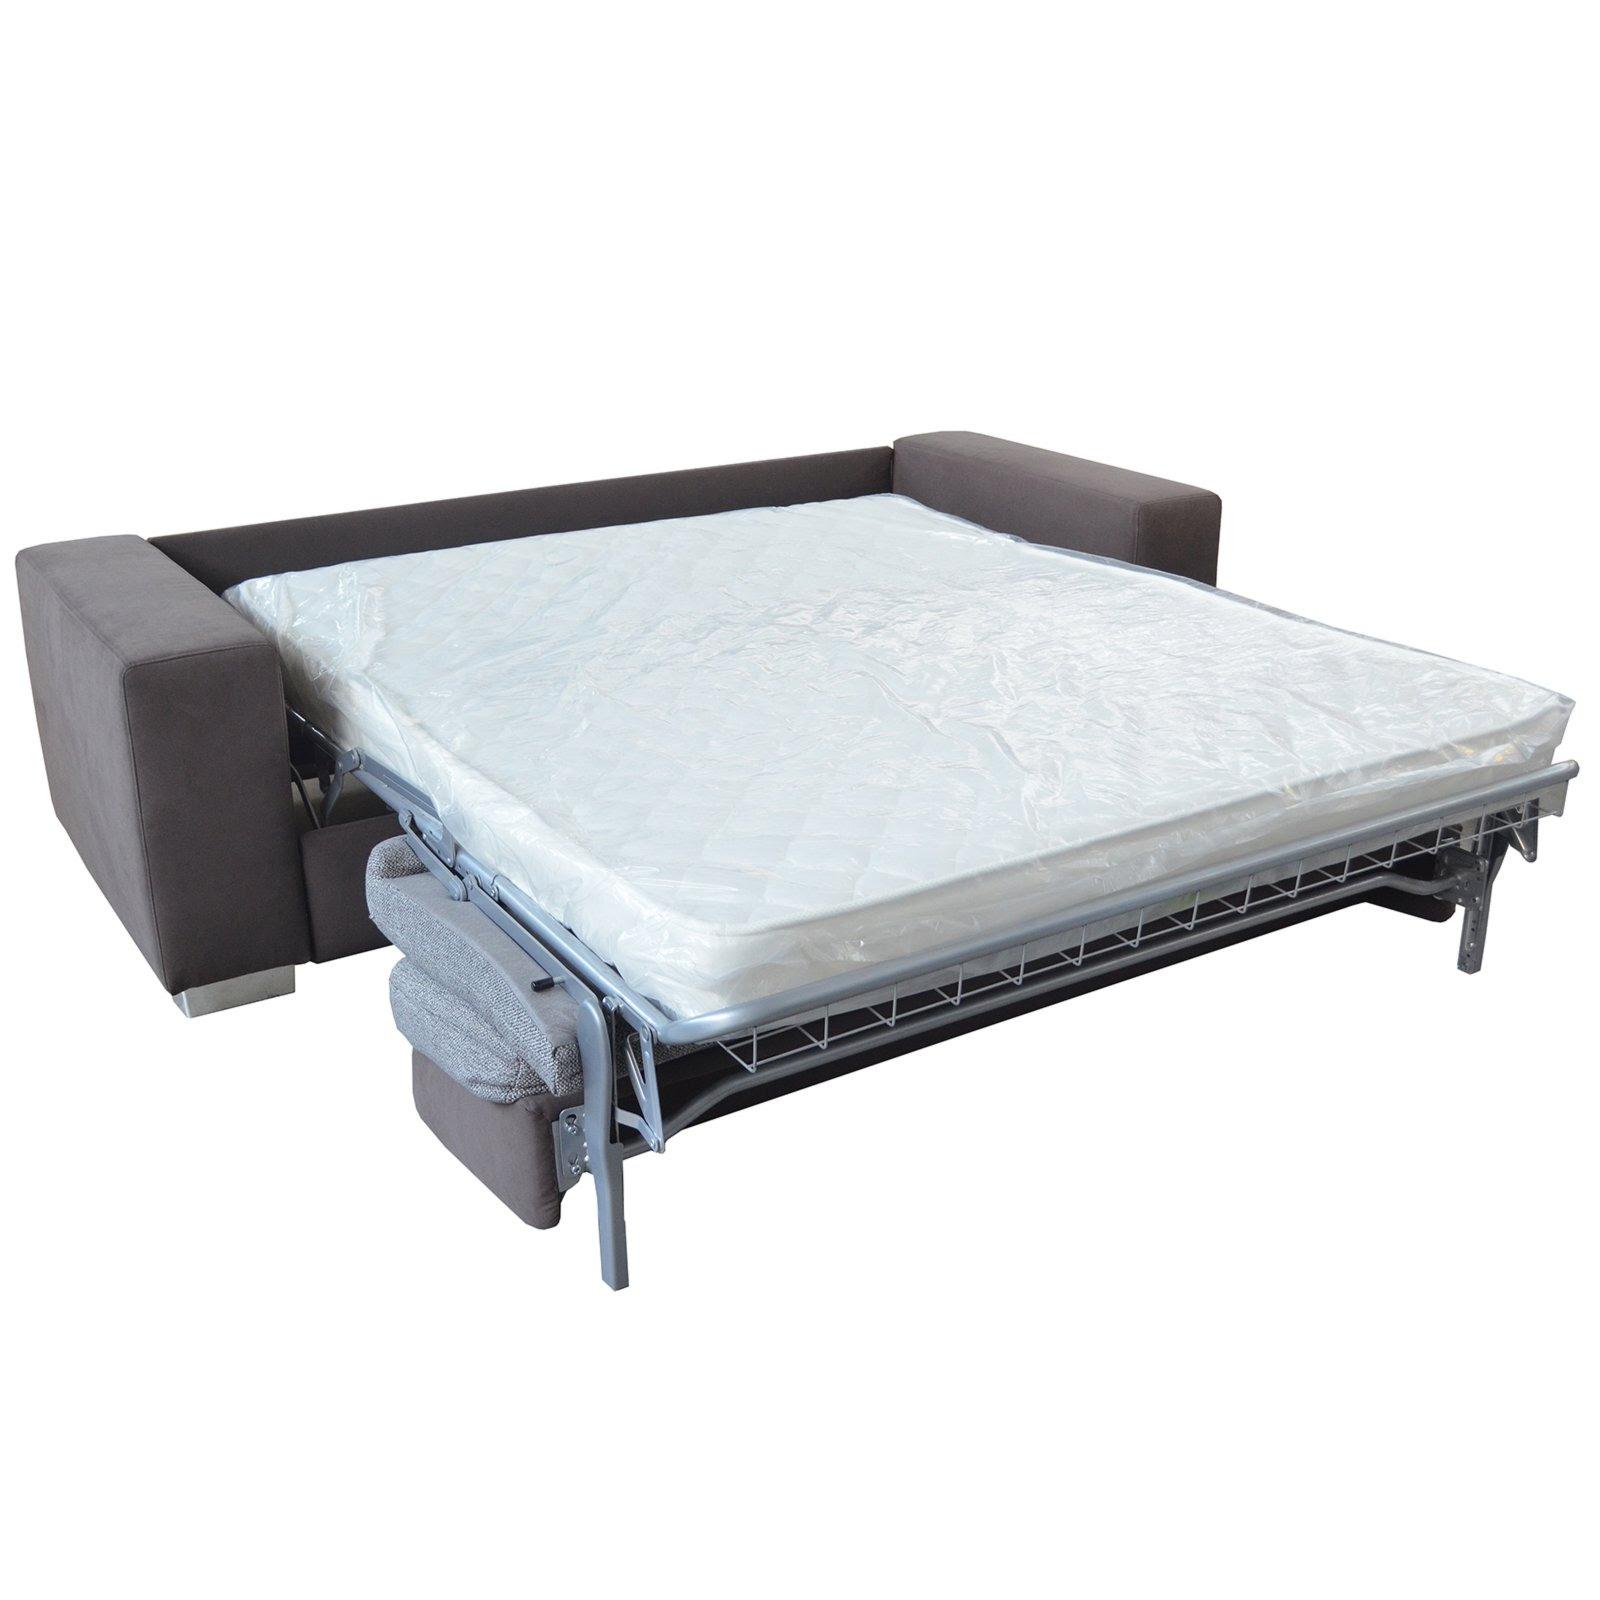 ROLLER Schlafsofa - grau - mit Matratze   eBay